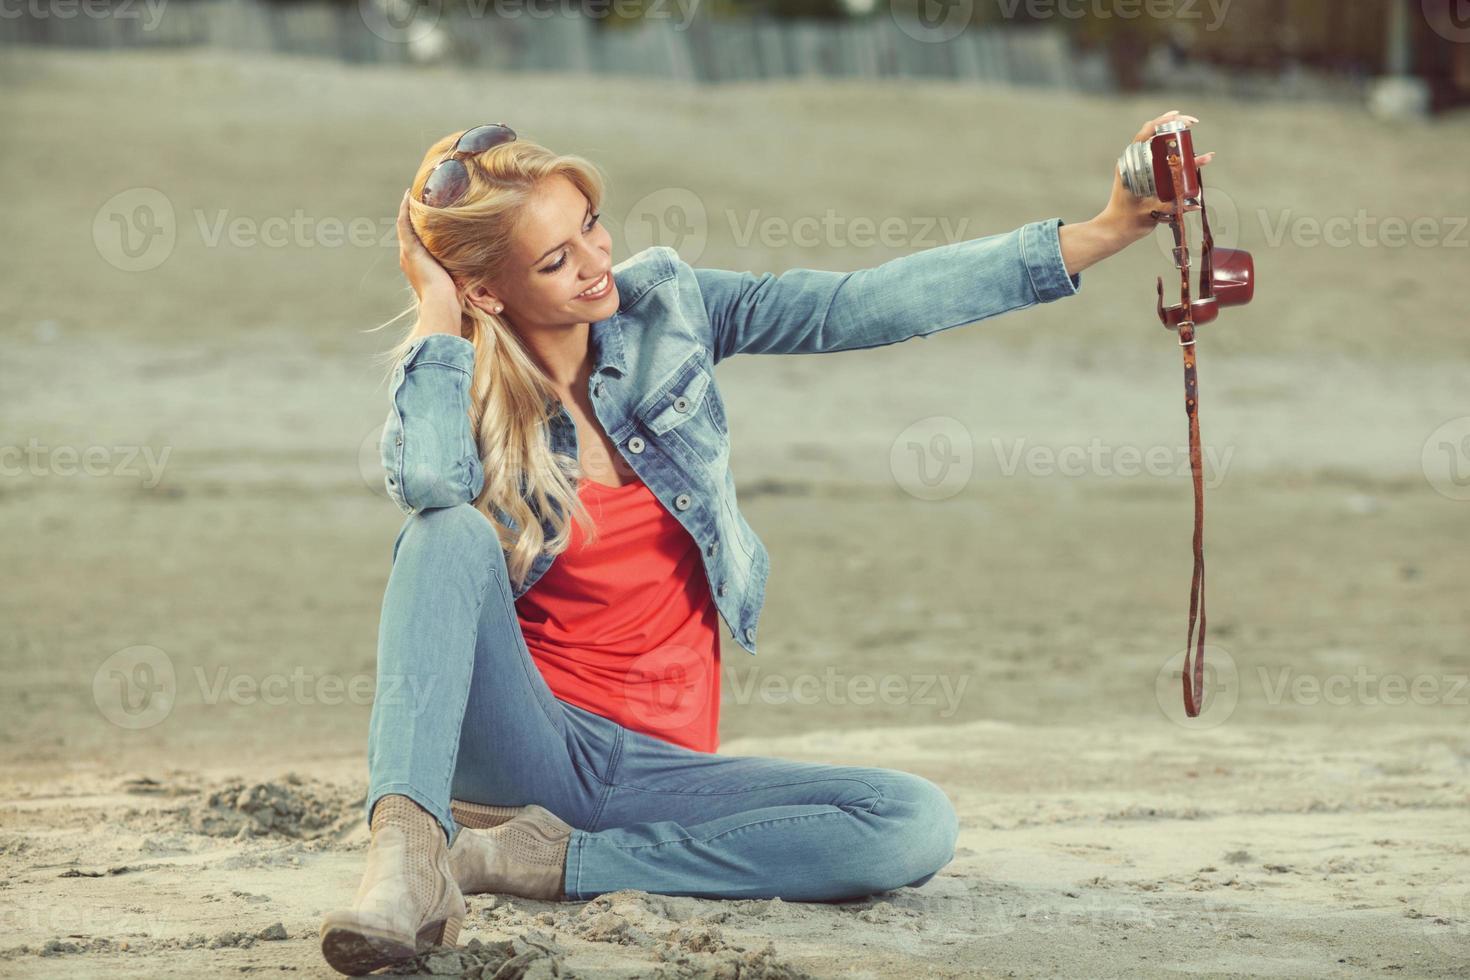 selfie con fotocamera analogica foto